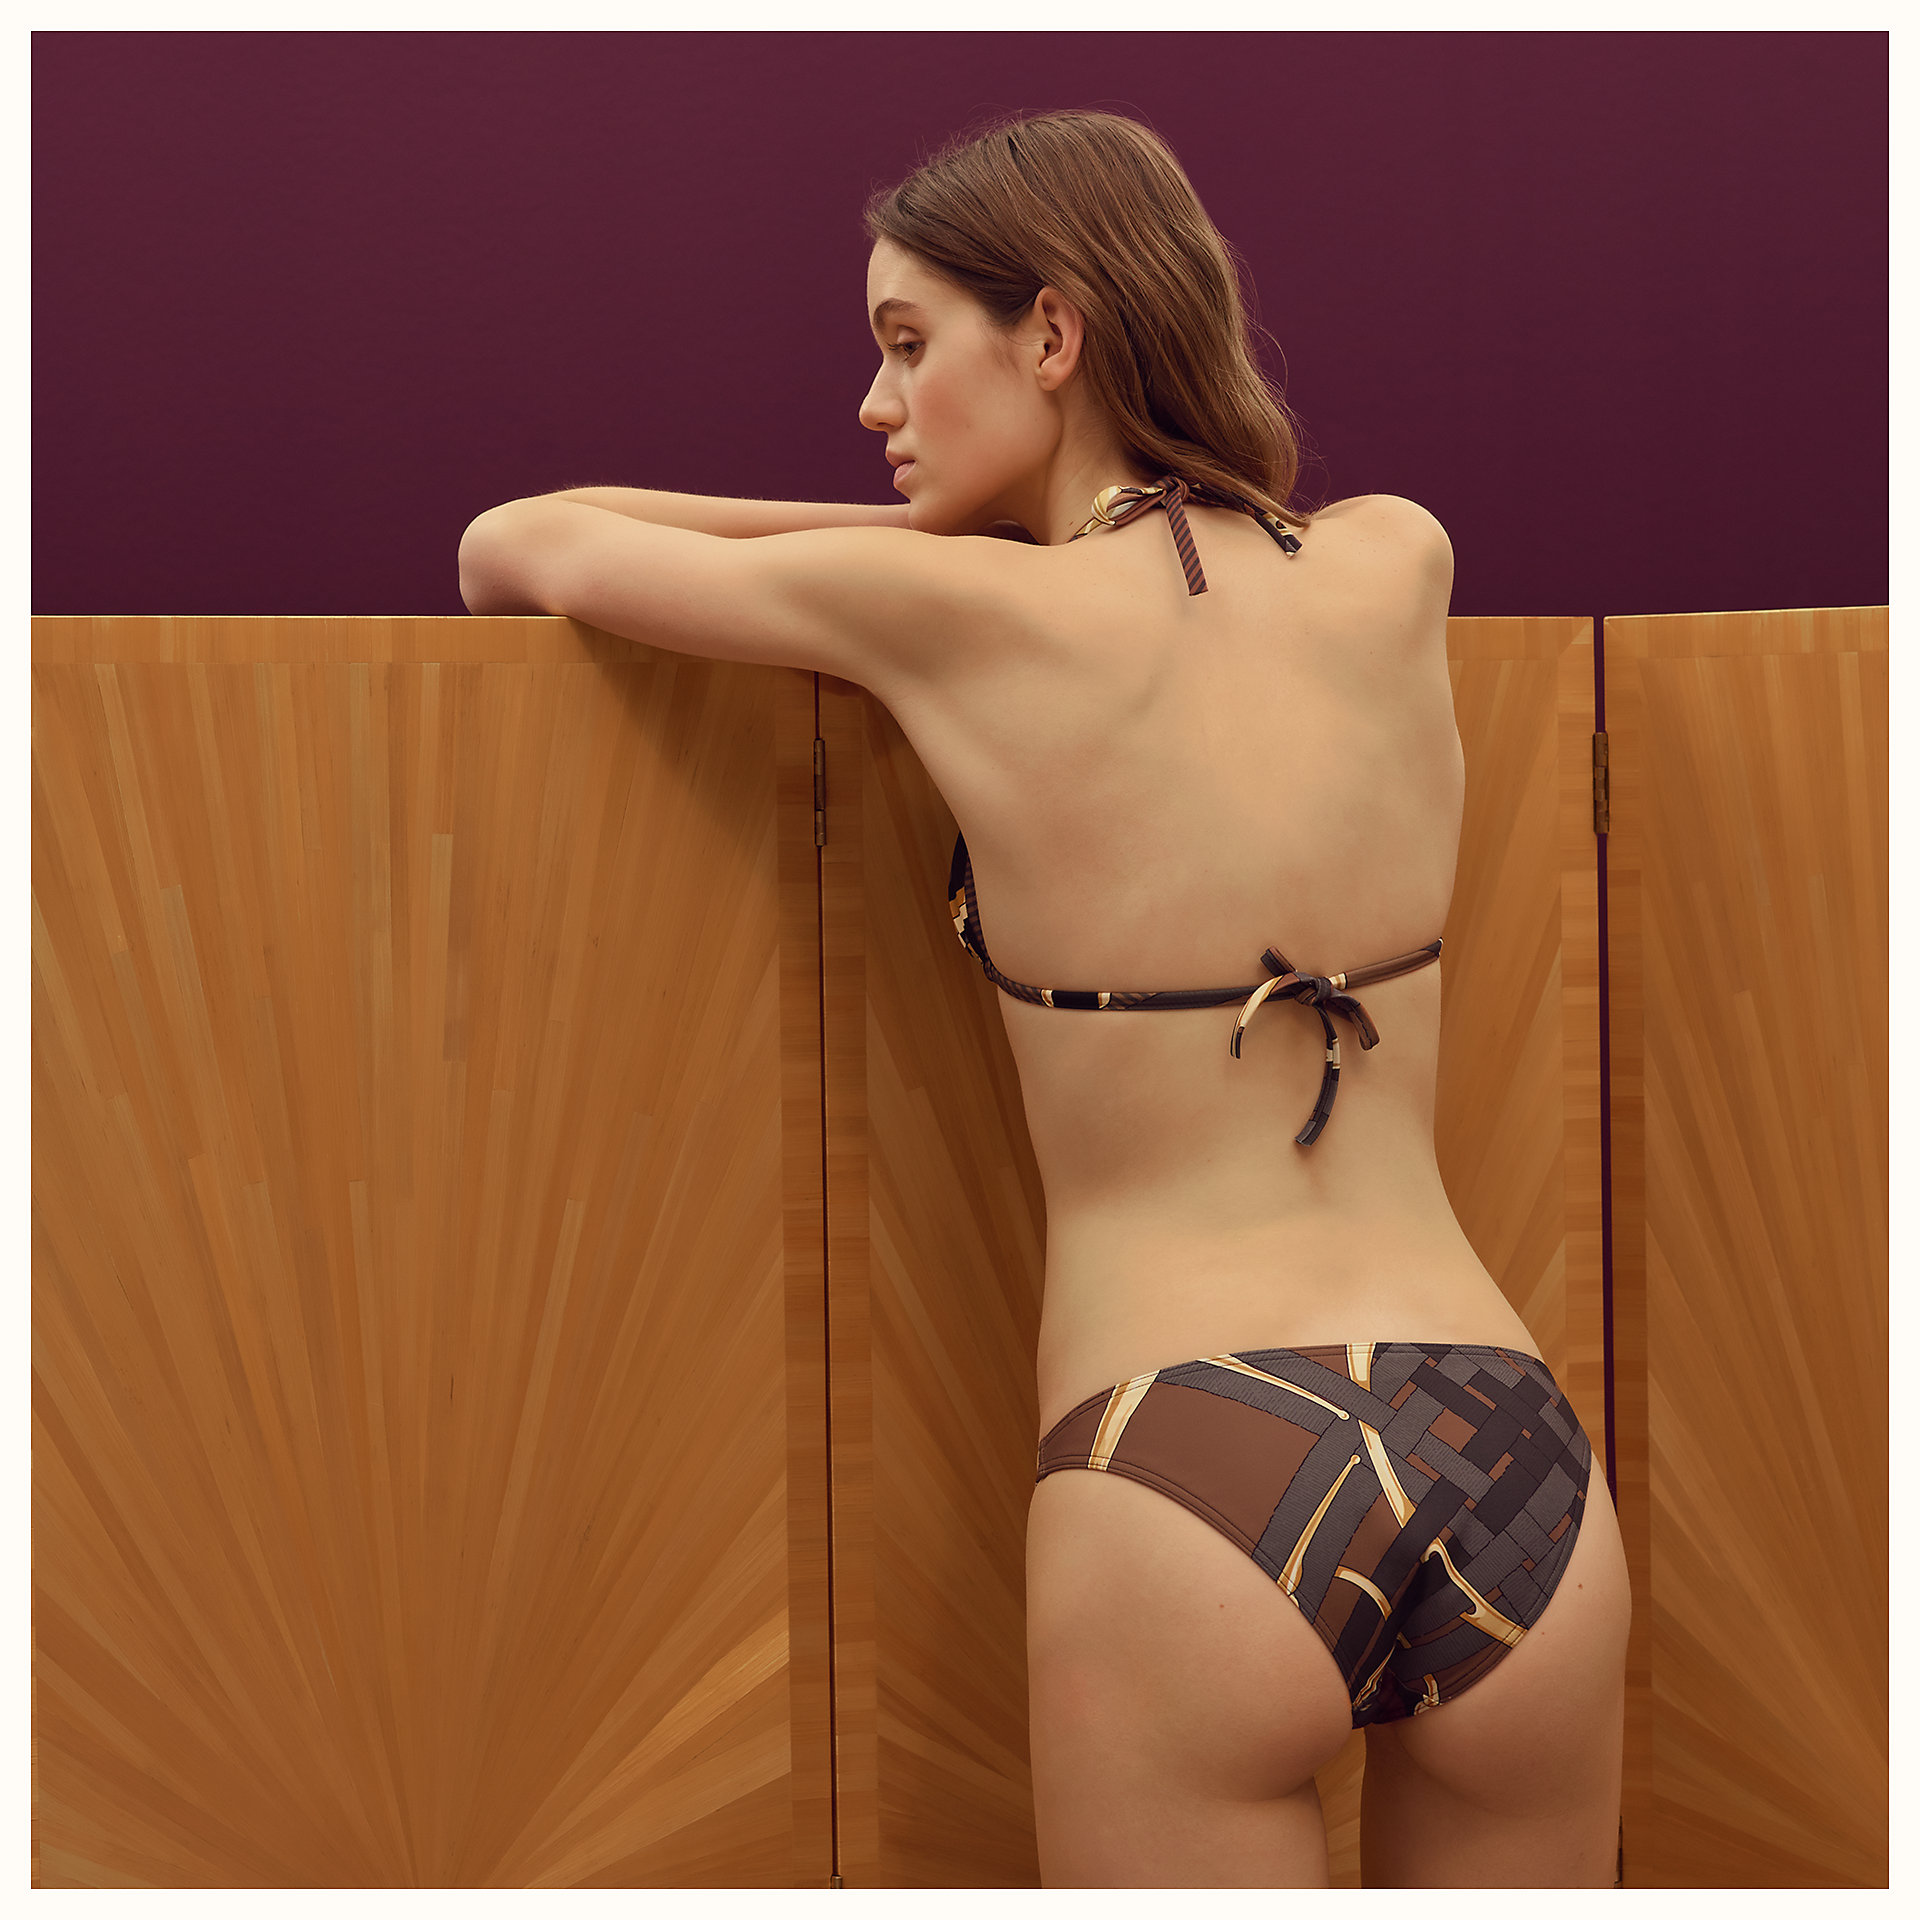 Hermes Palerme bikini